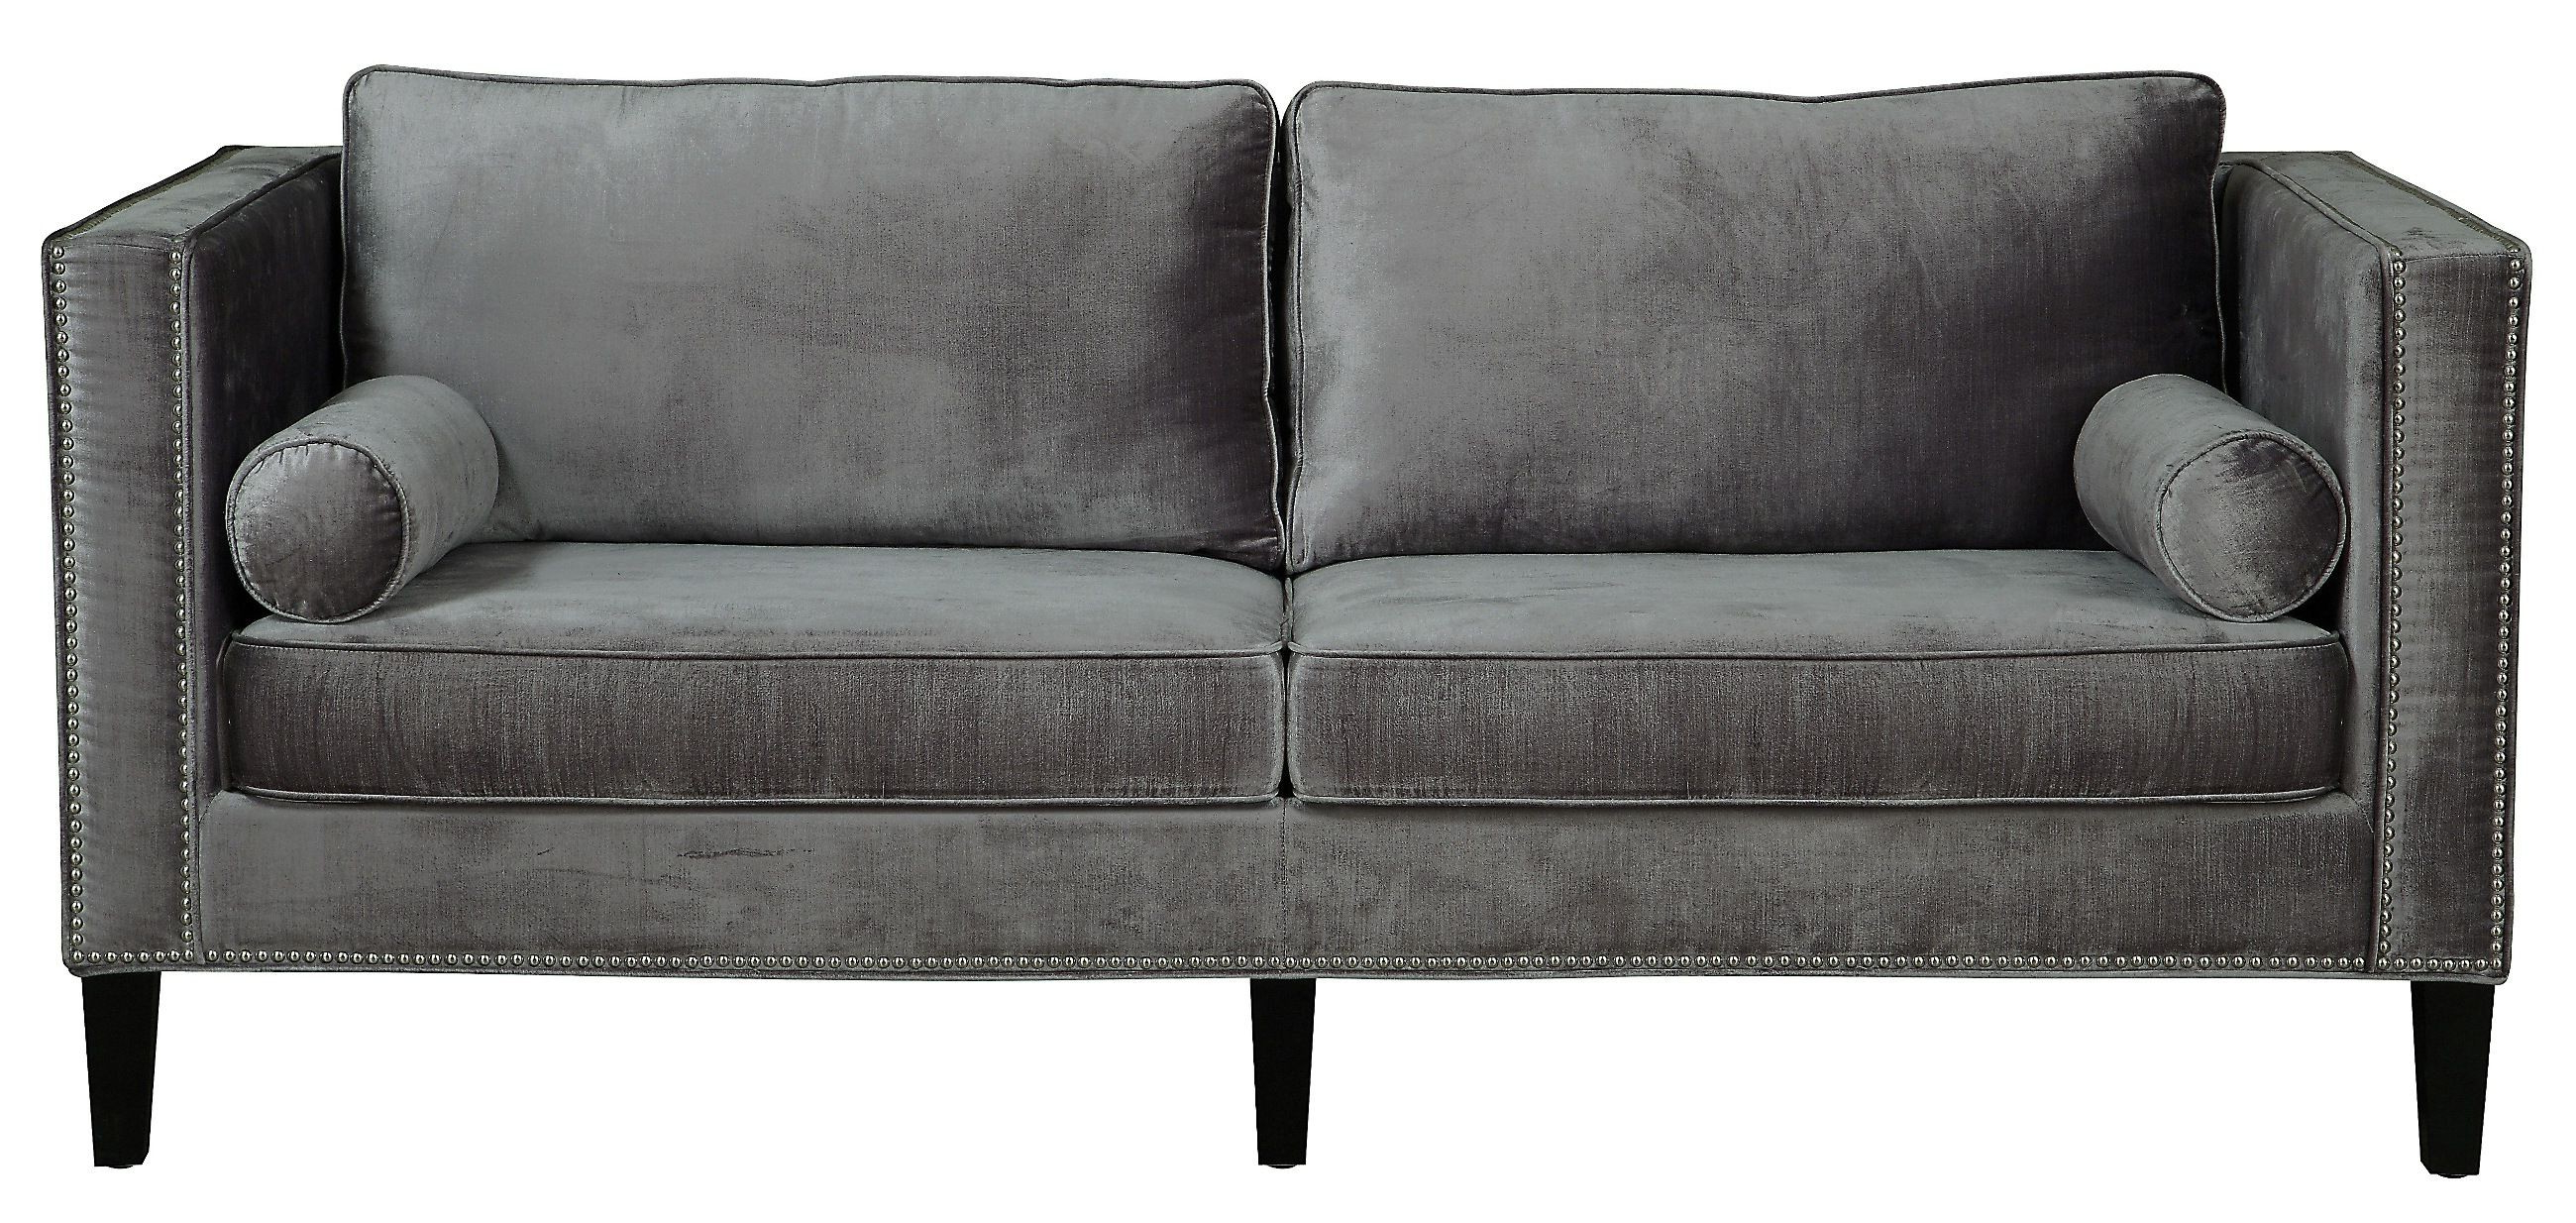 London Dark Grey Sofa Chairs Regarding Trendy Grey Velvet Sofa Sets Farmhousegray With Nailhead Trimgrey Farmhouse (View 16 of 20)